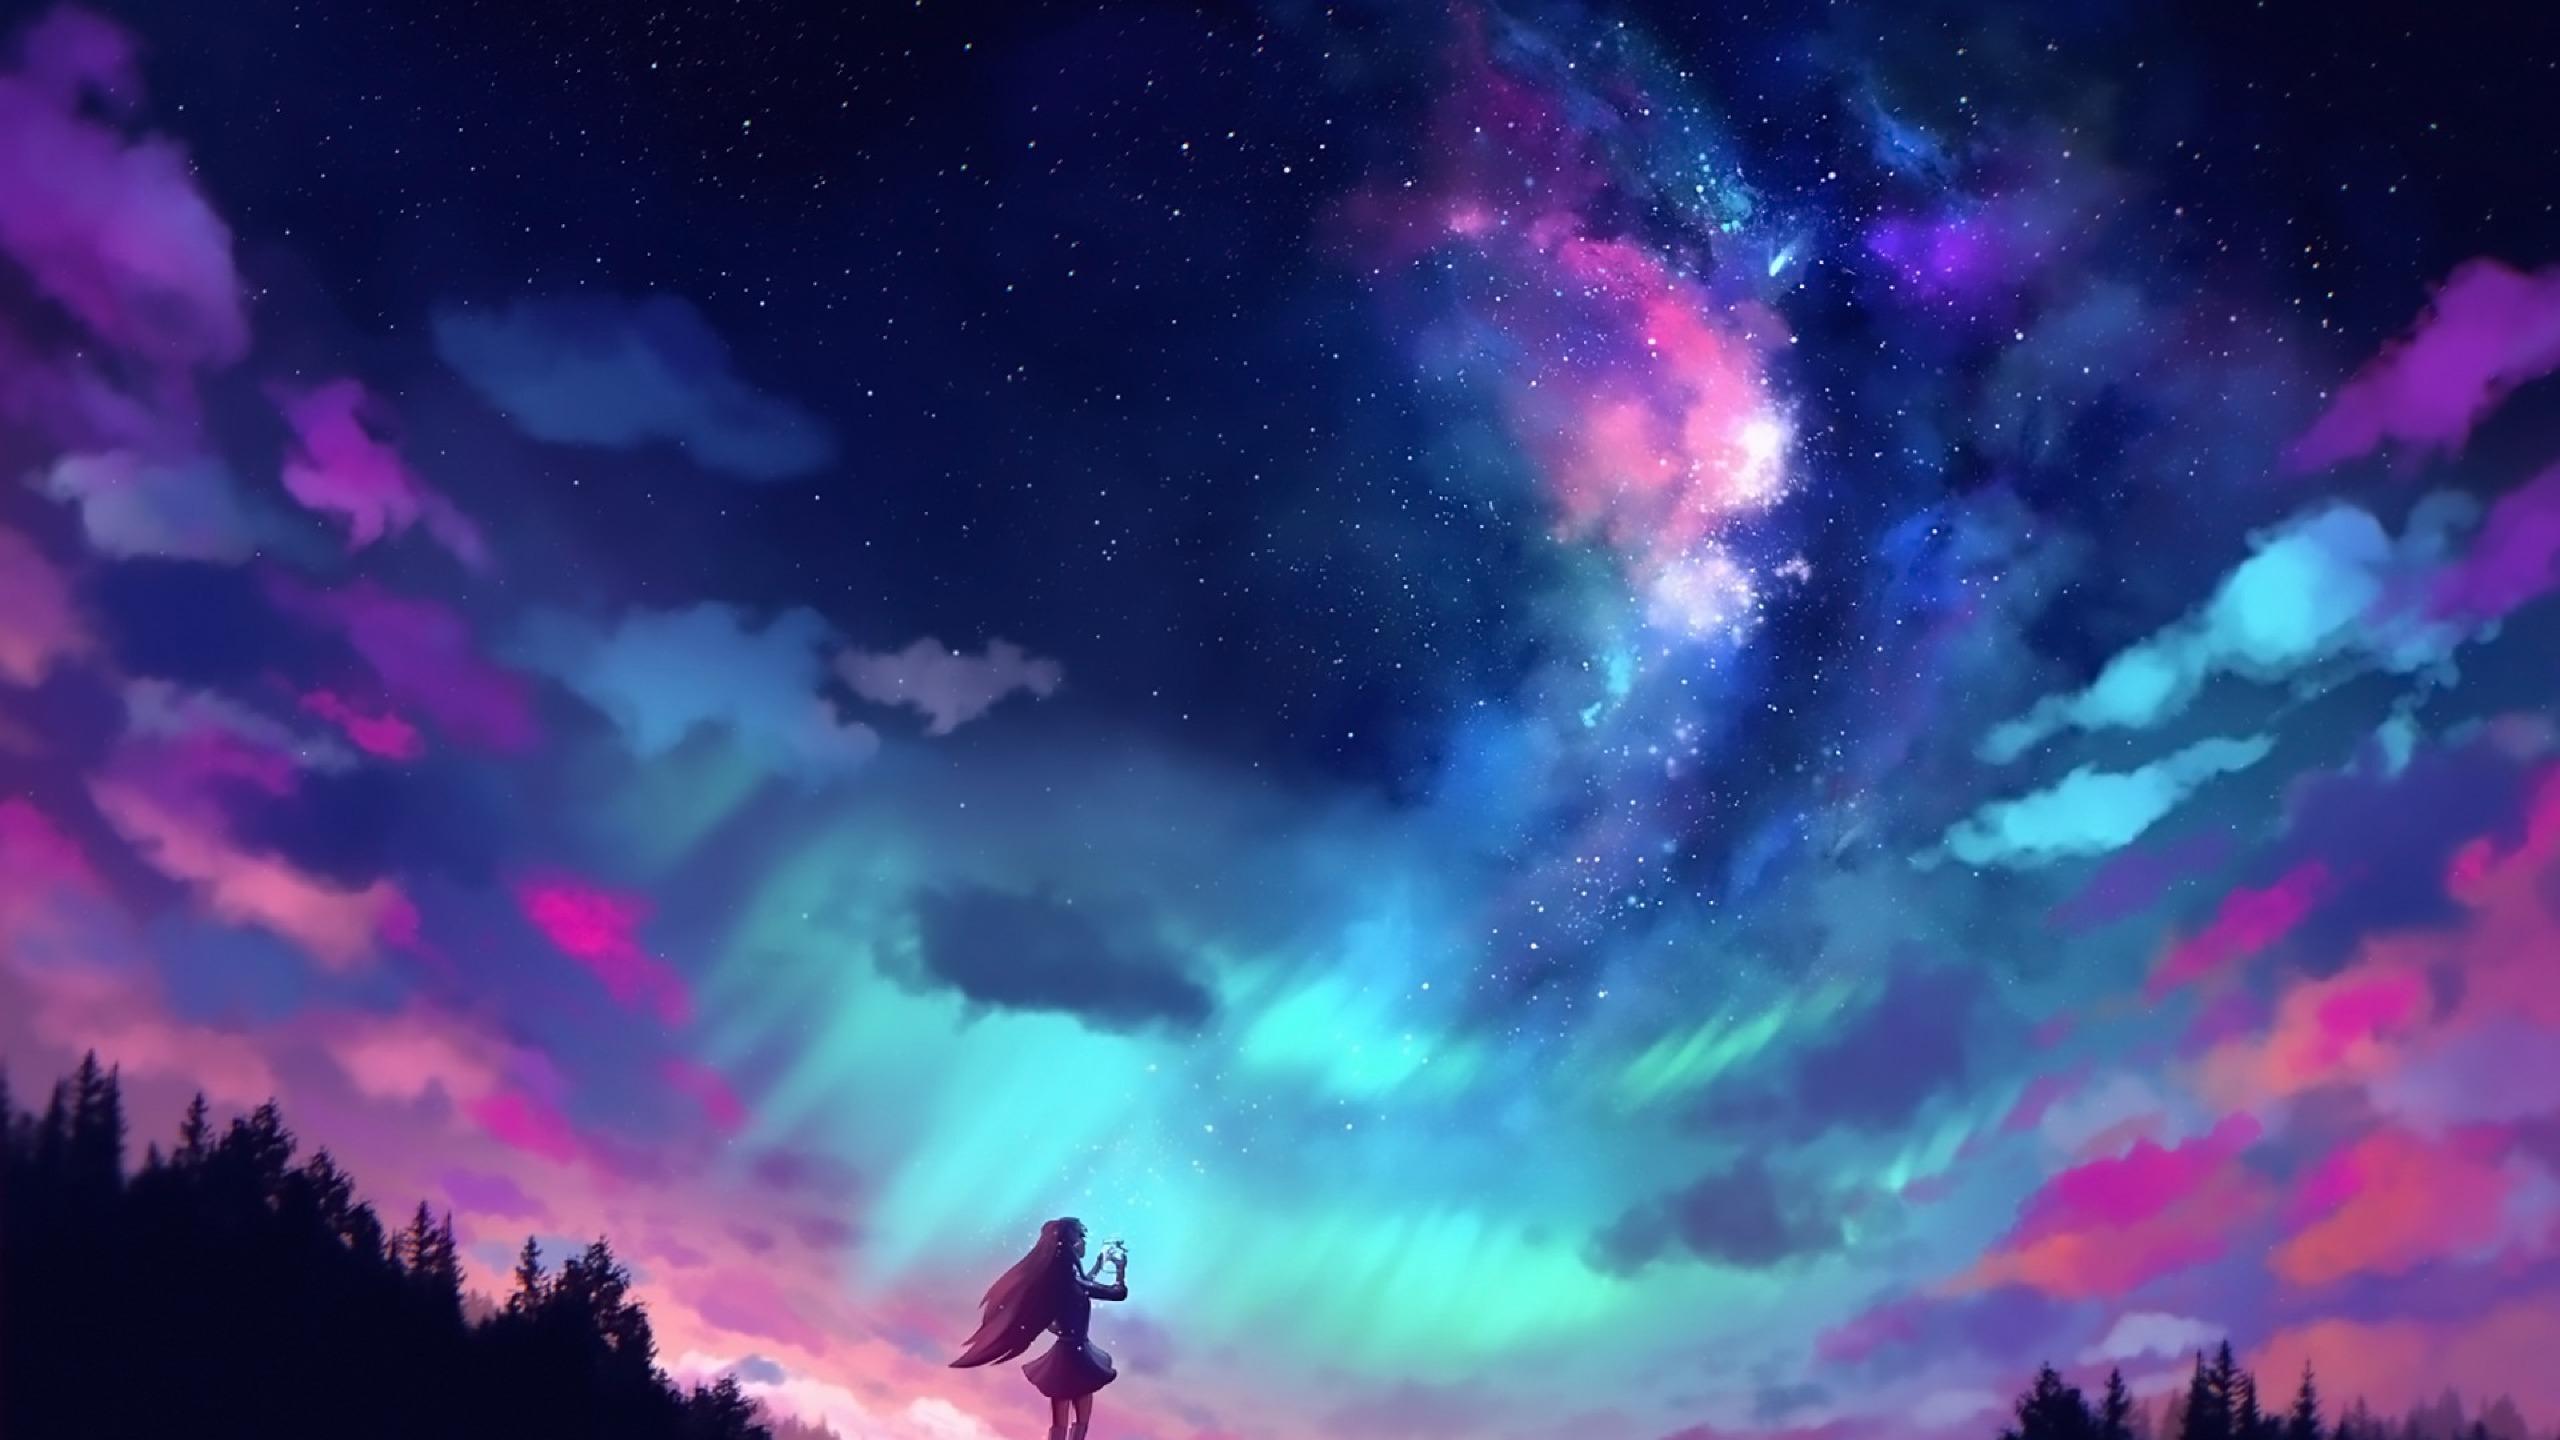 Anime Sky Wallpaper 4k 2560x1440 Wallpaper Teahub Io